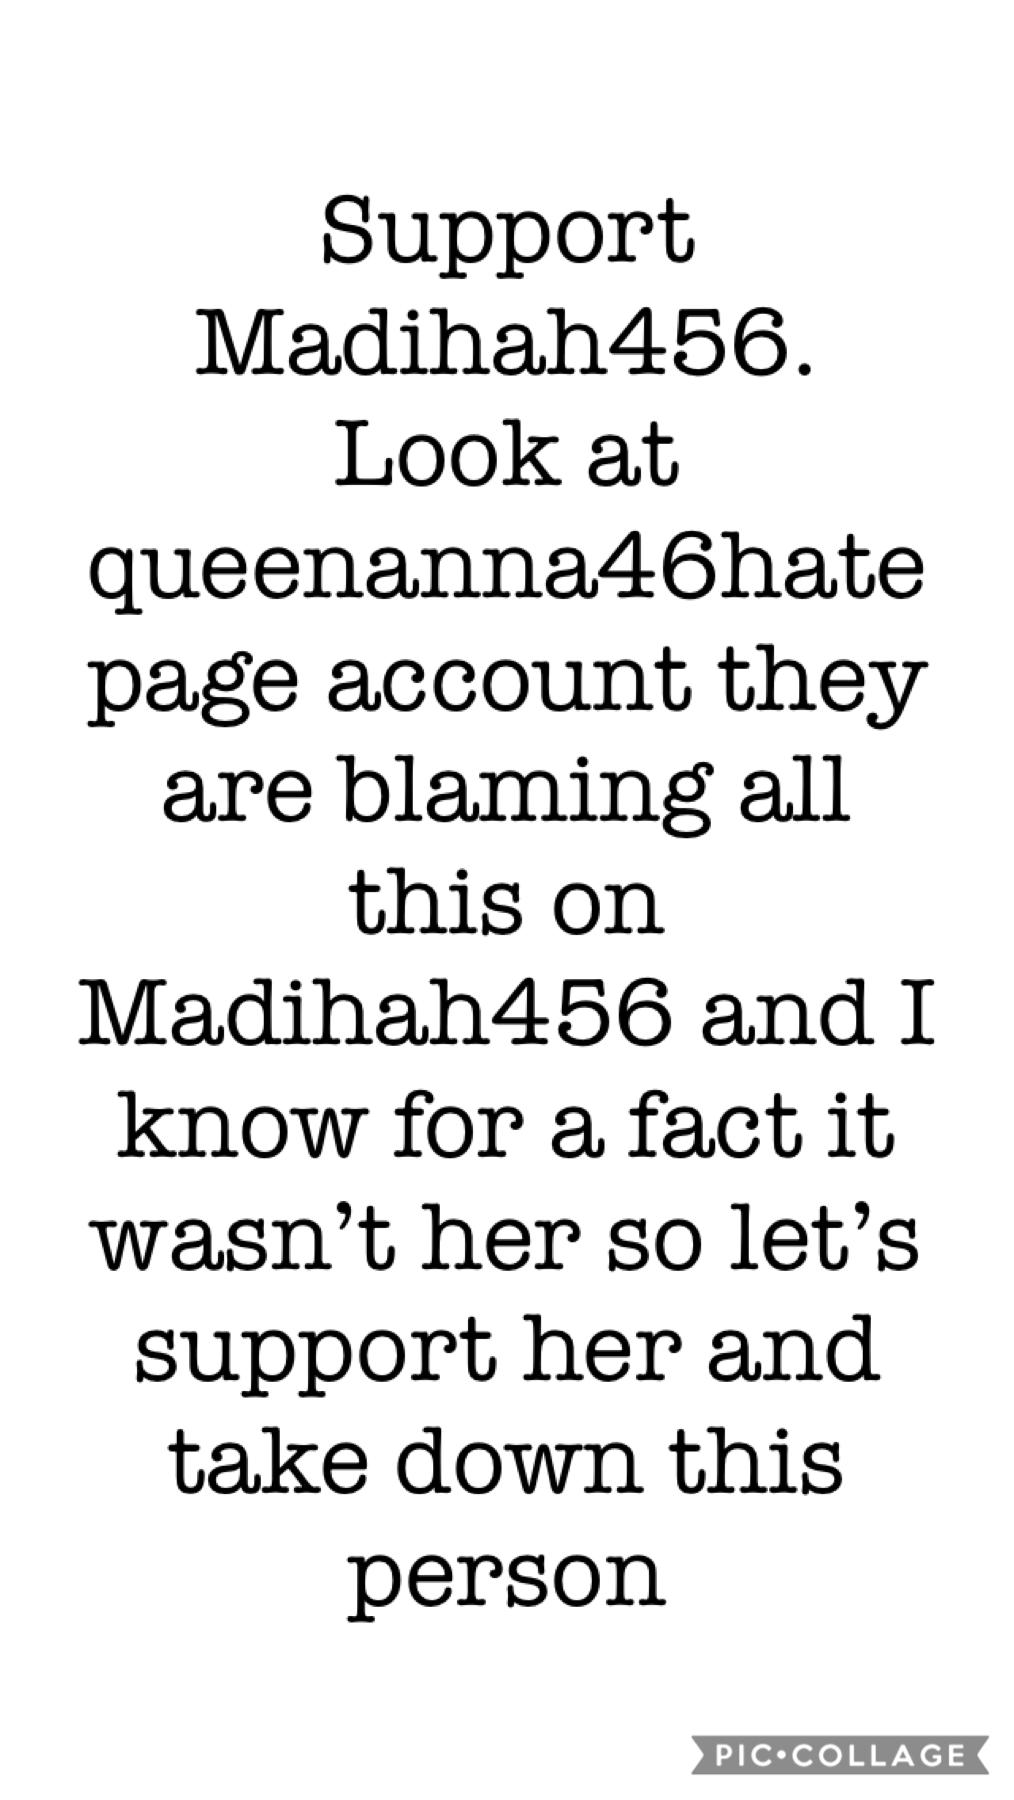 Help Madihah456